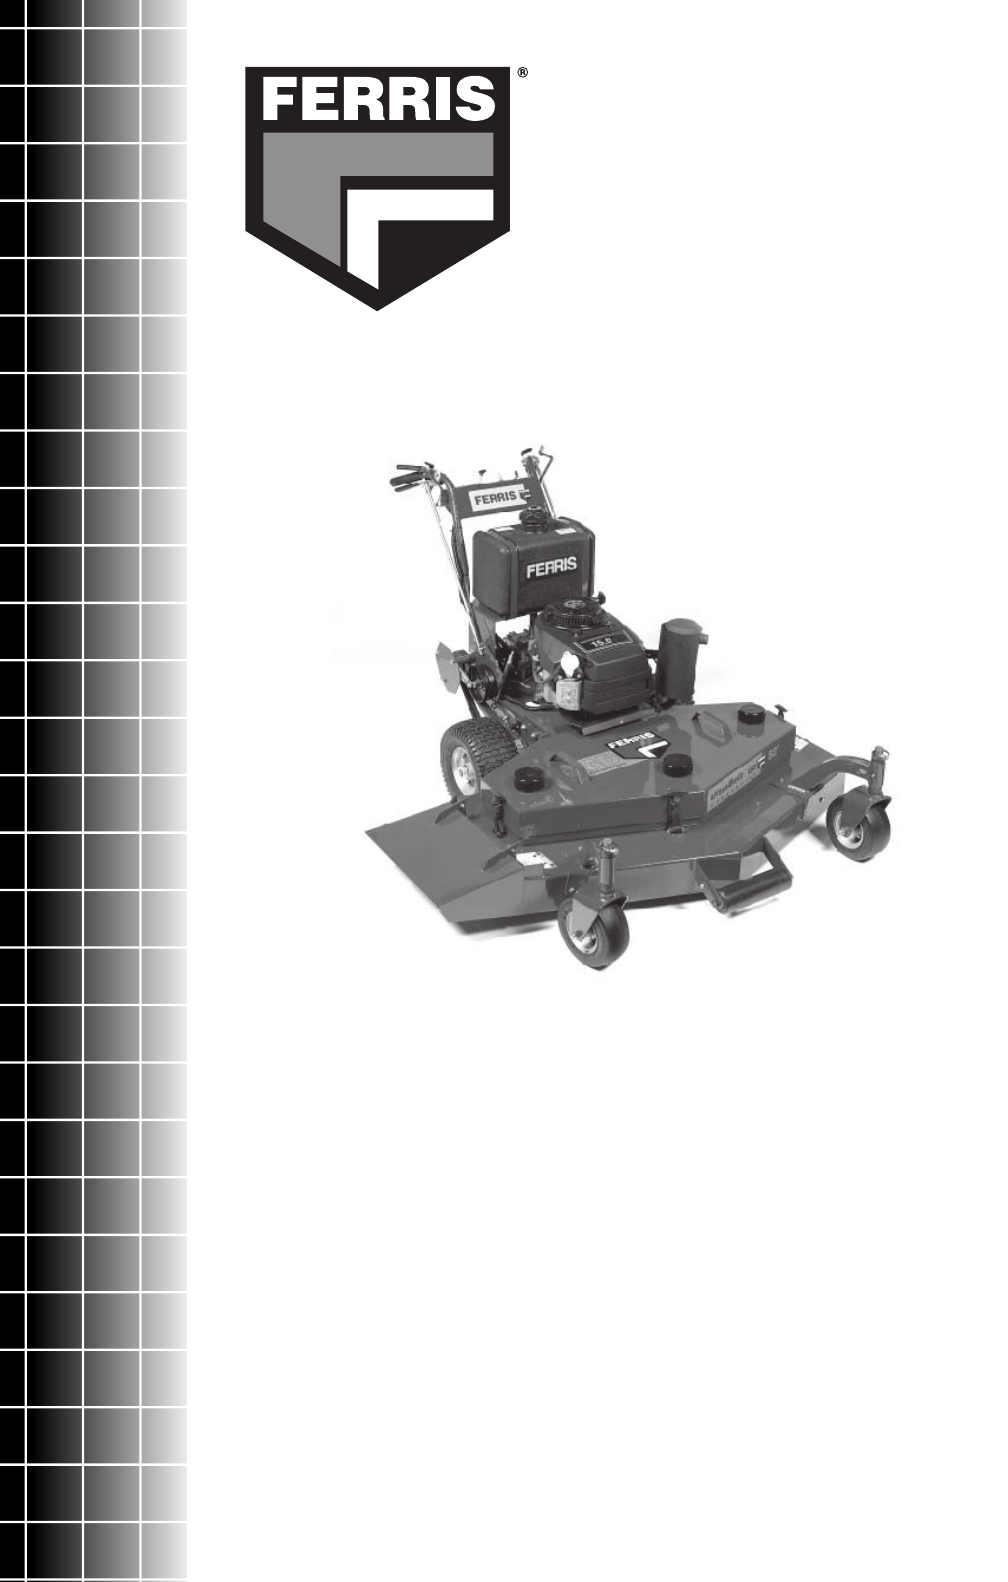 hight resolution of ferri mower schematic